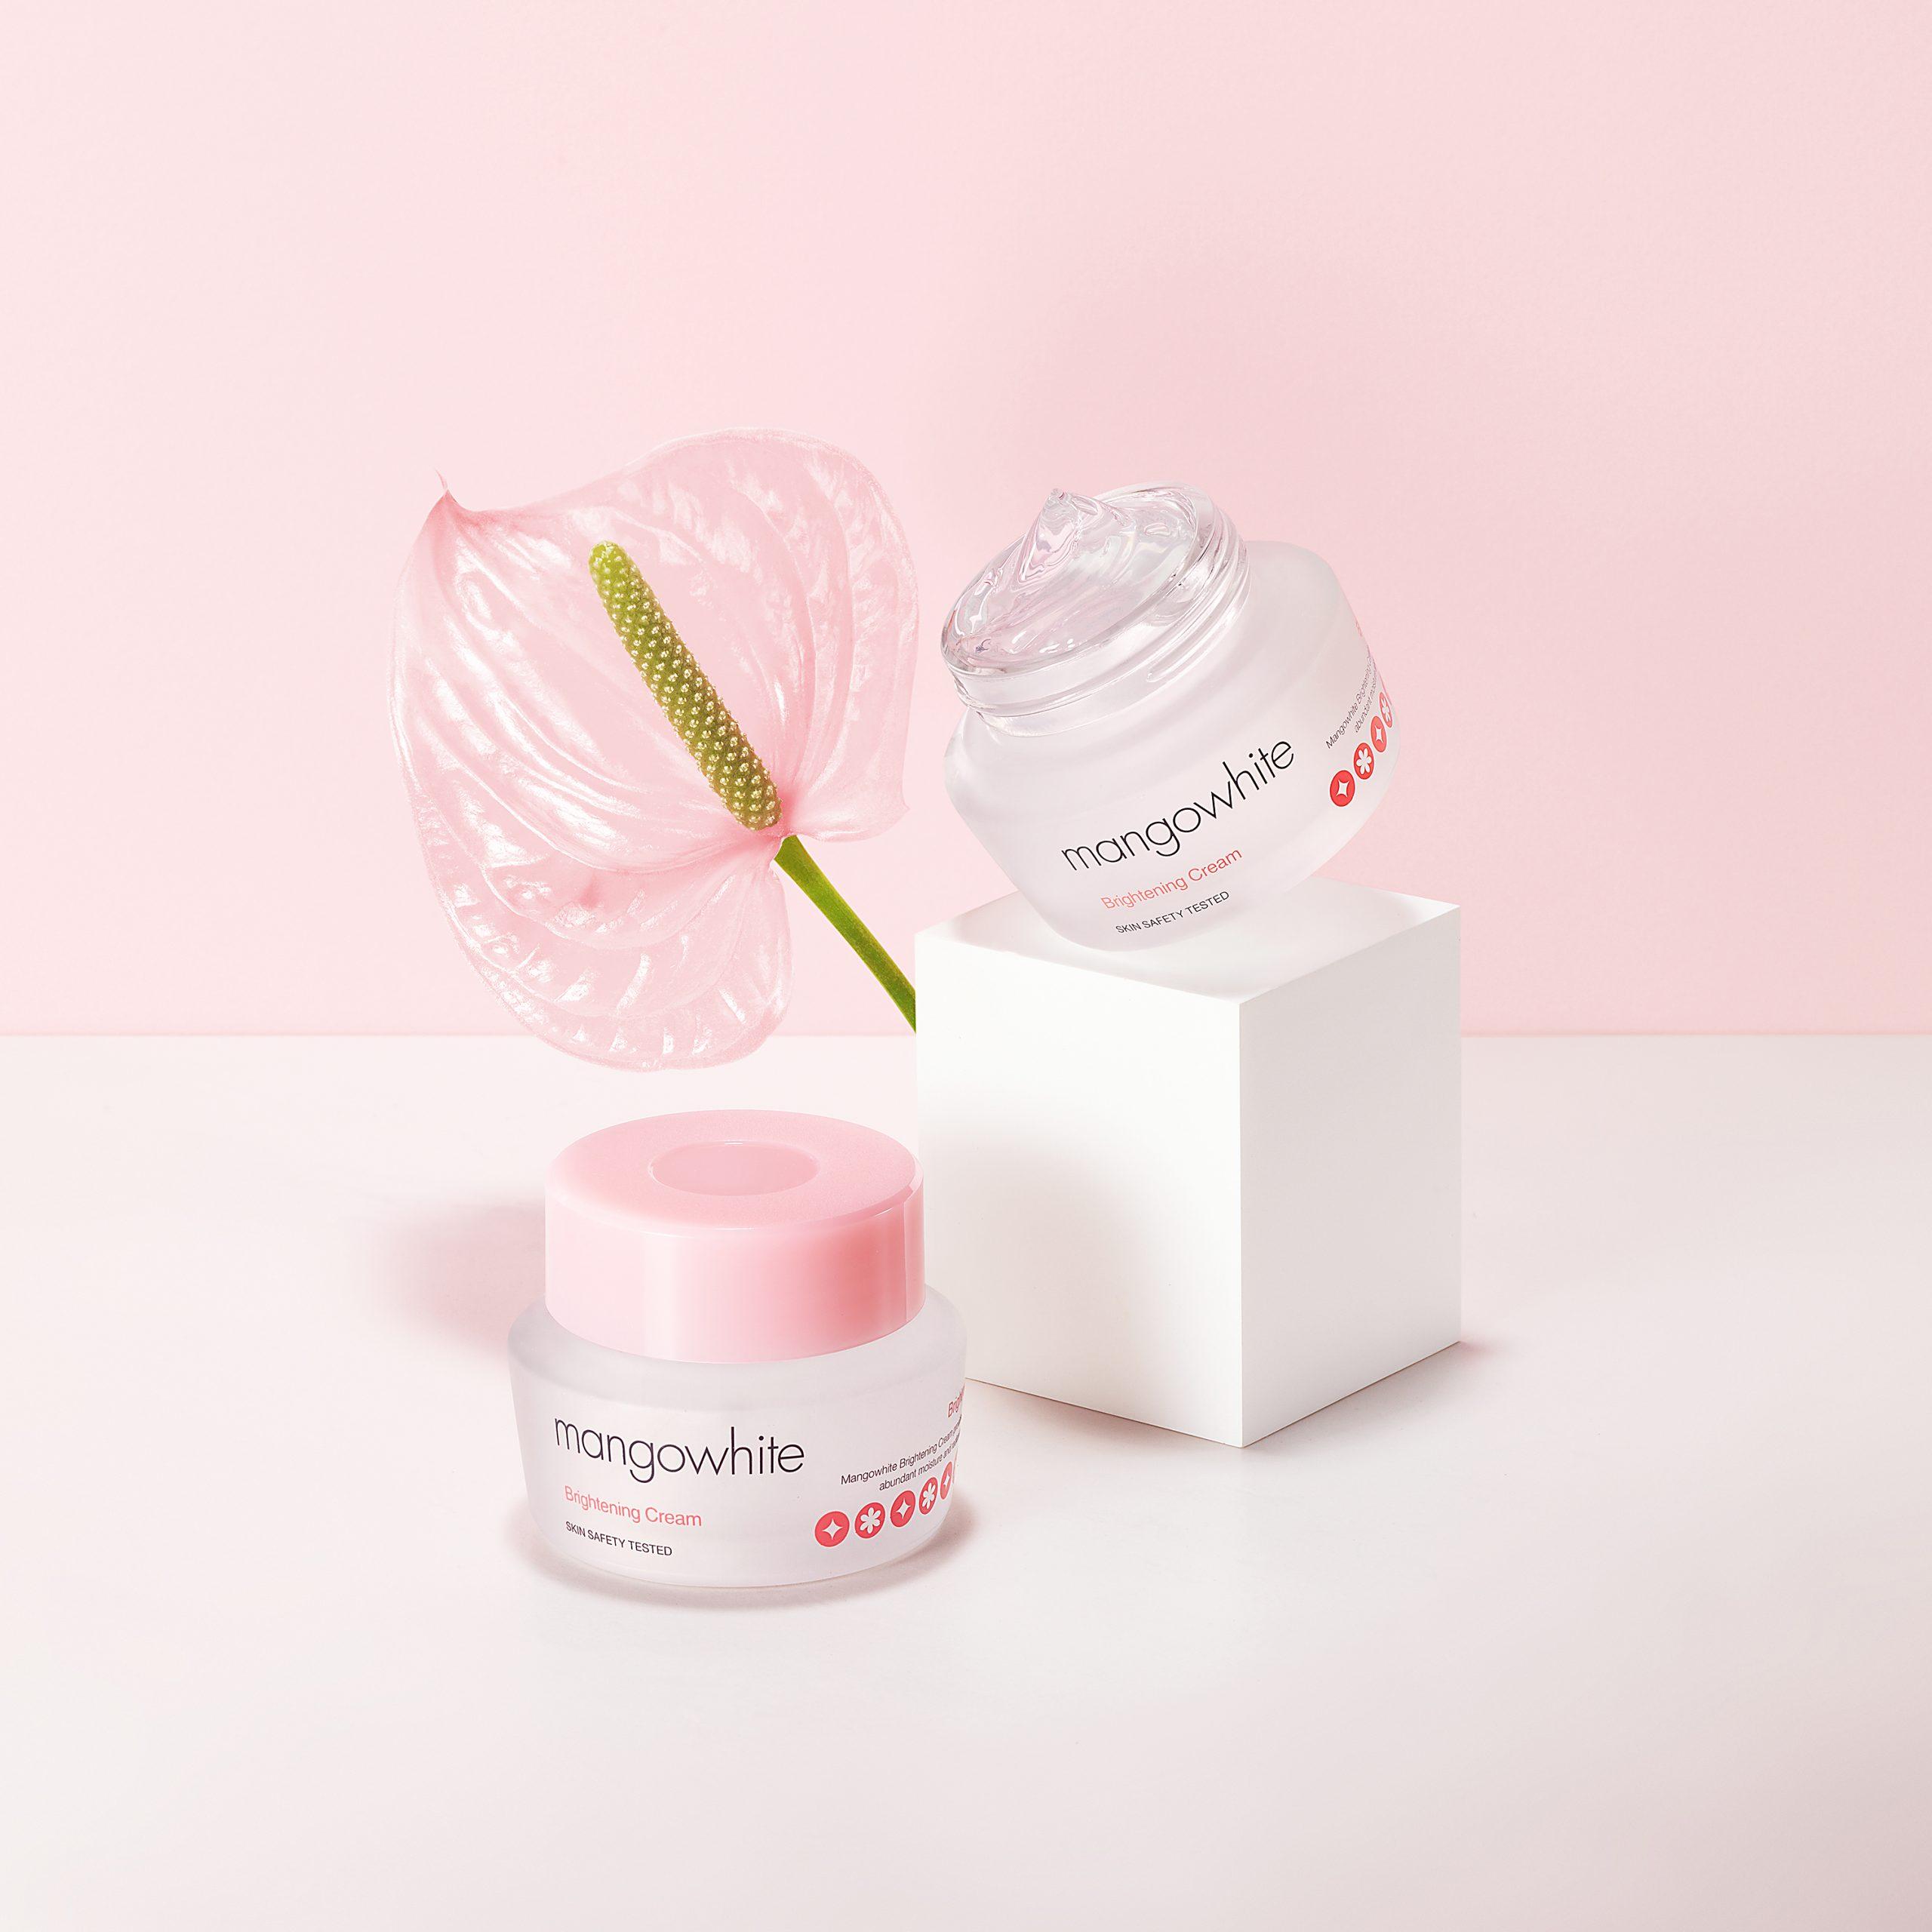 Mangowhite brightening cream - Maccaron   Shop Korean Skin Care in India at  best